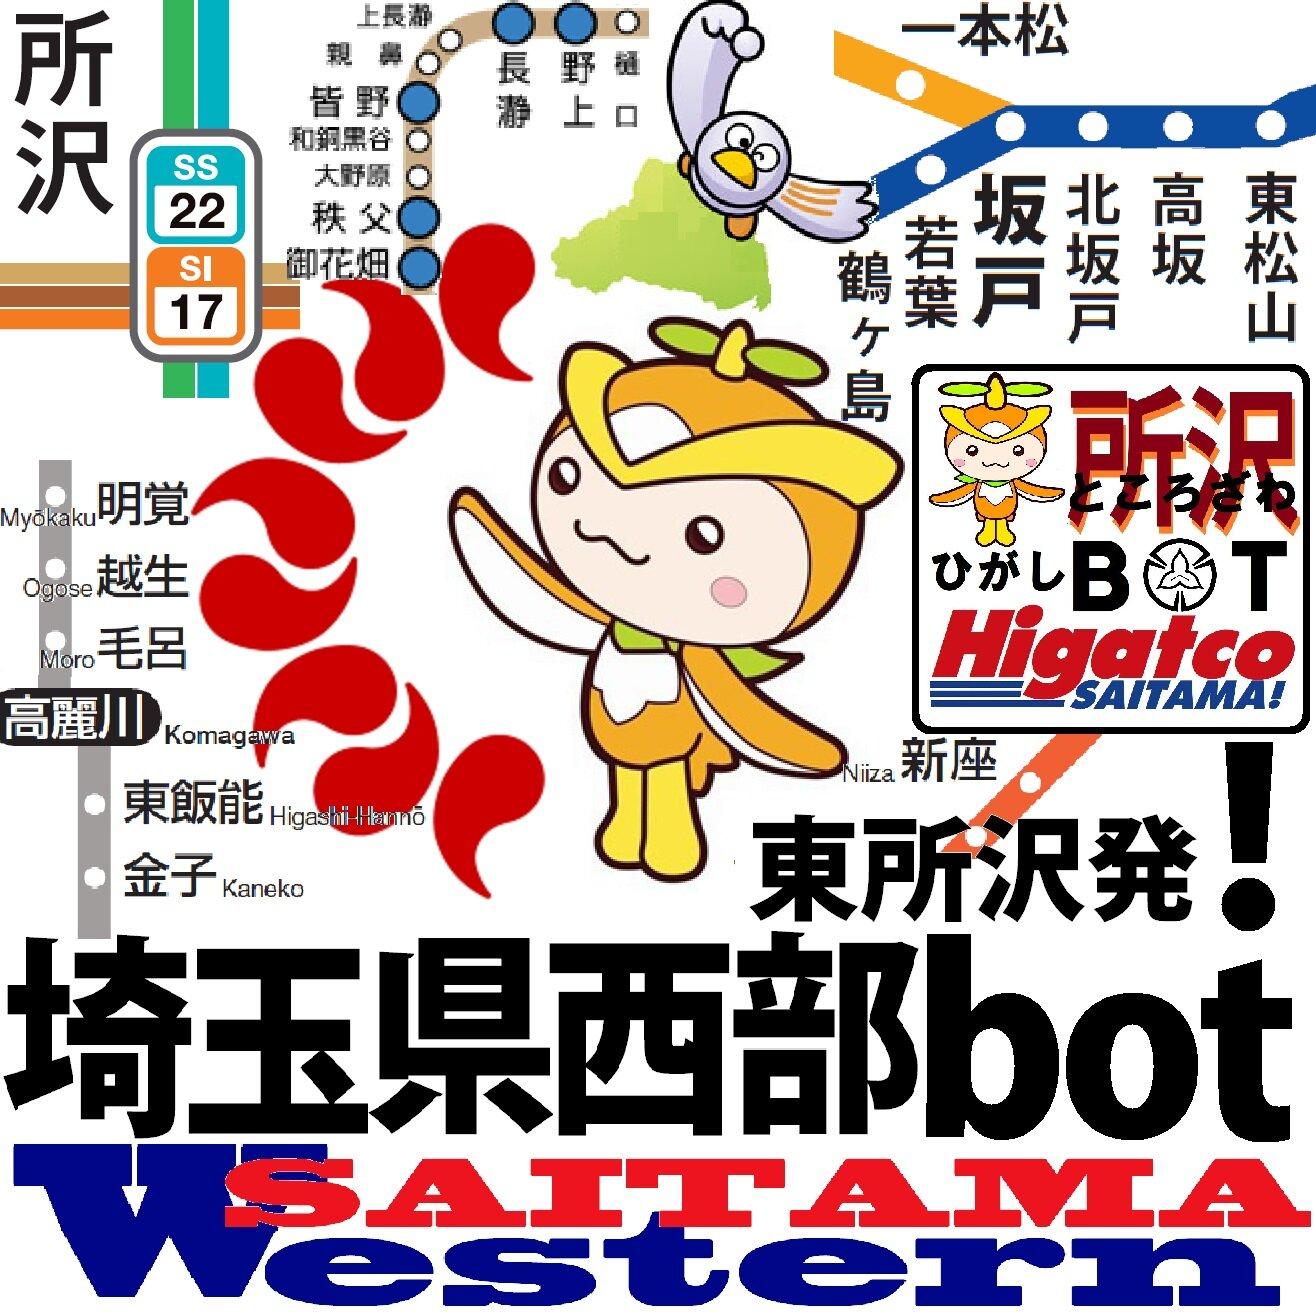 @higatoko_bot